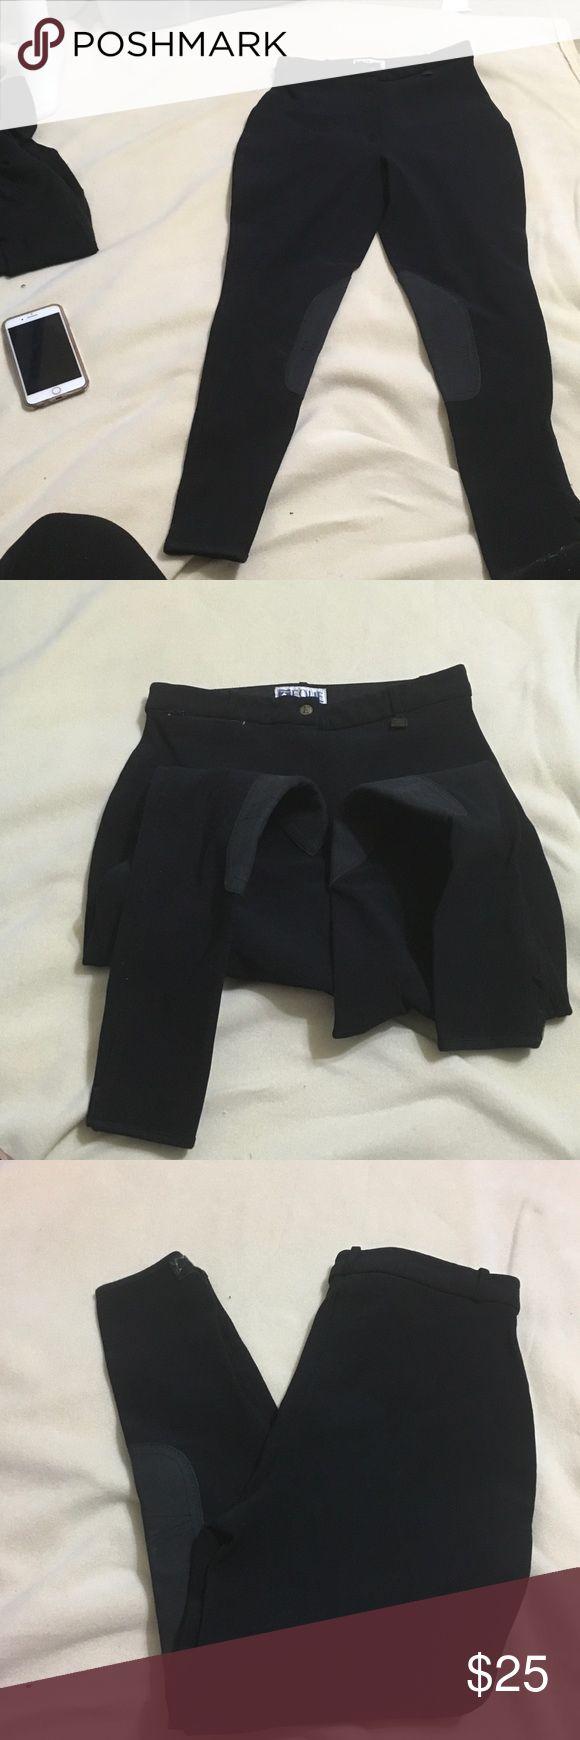 Cavalier Equestrian fashion Size 30 cavalier Pants Leggings